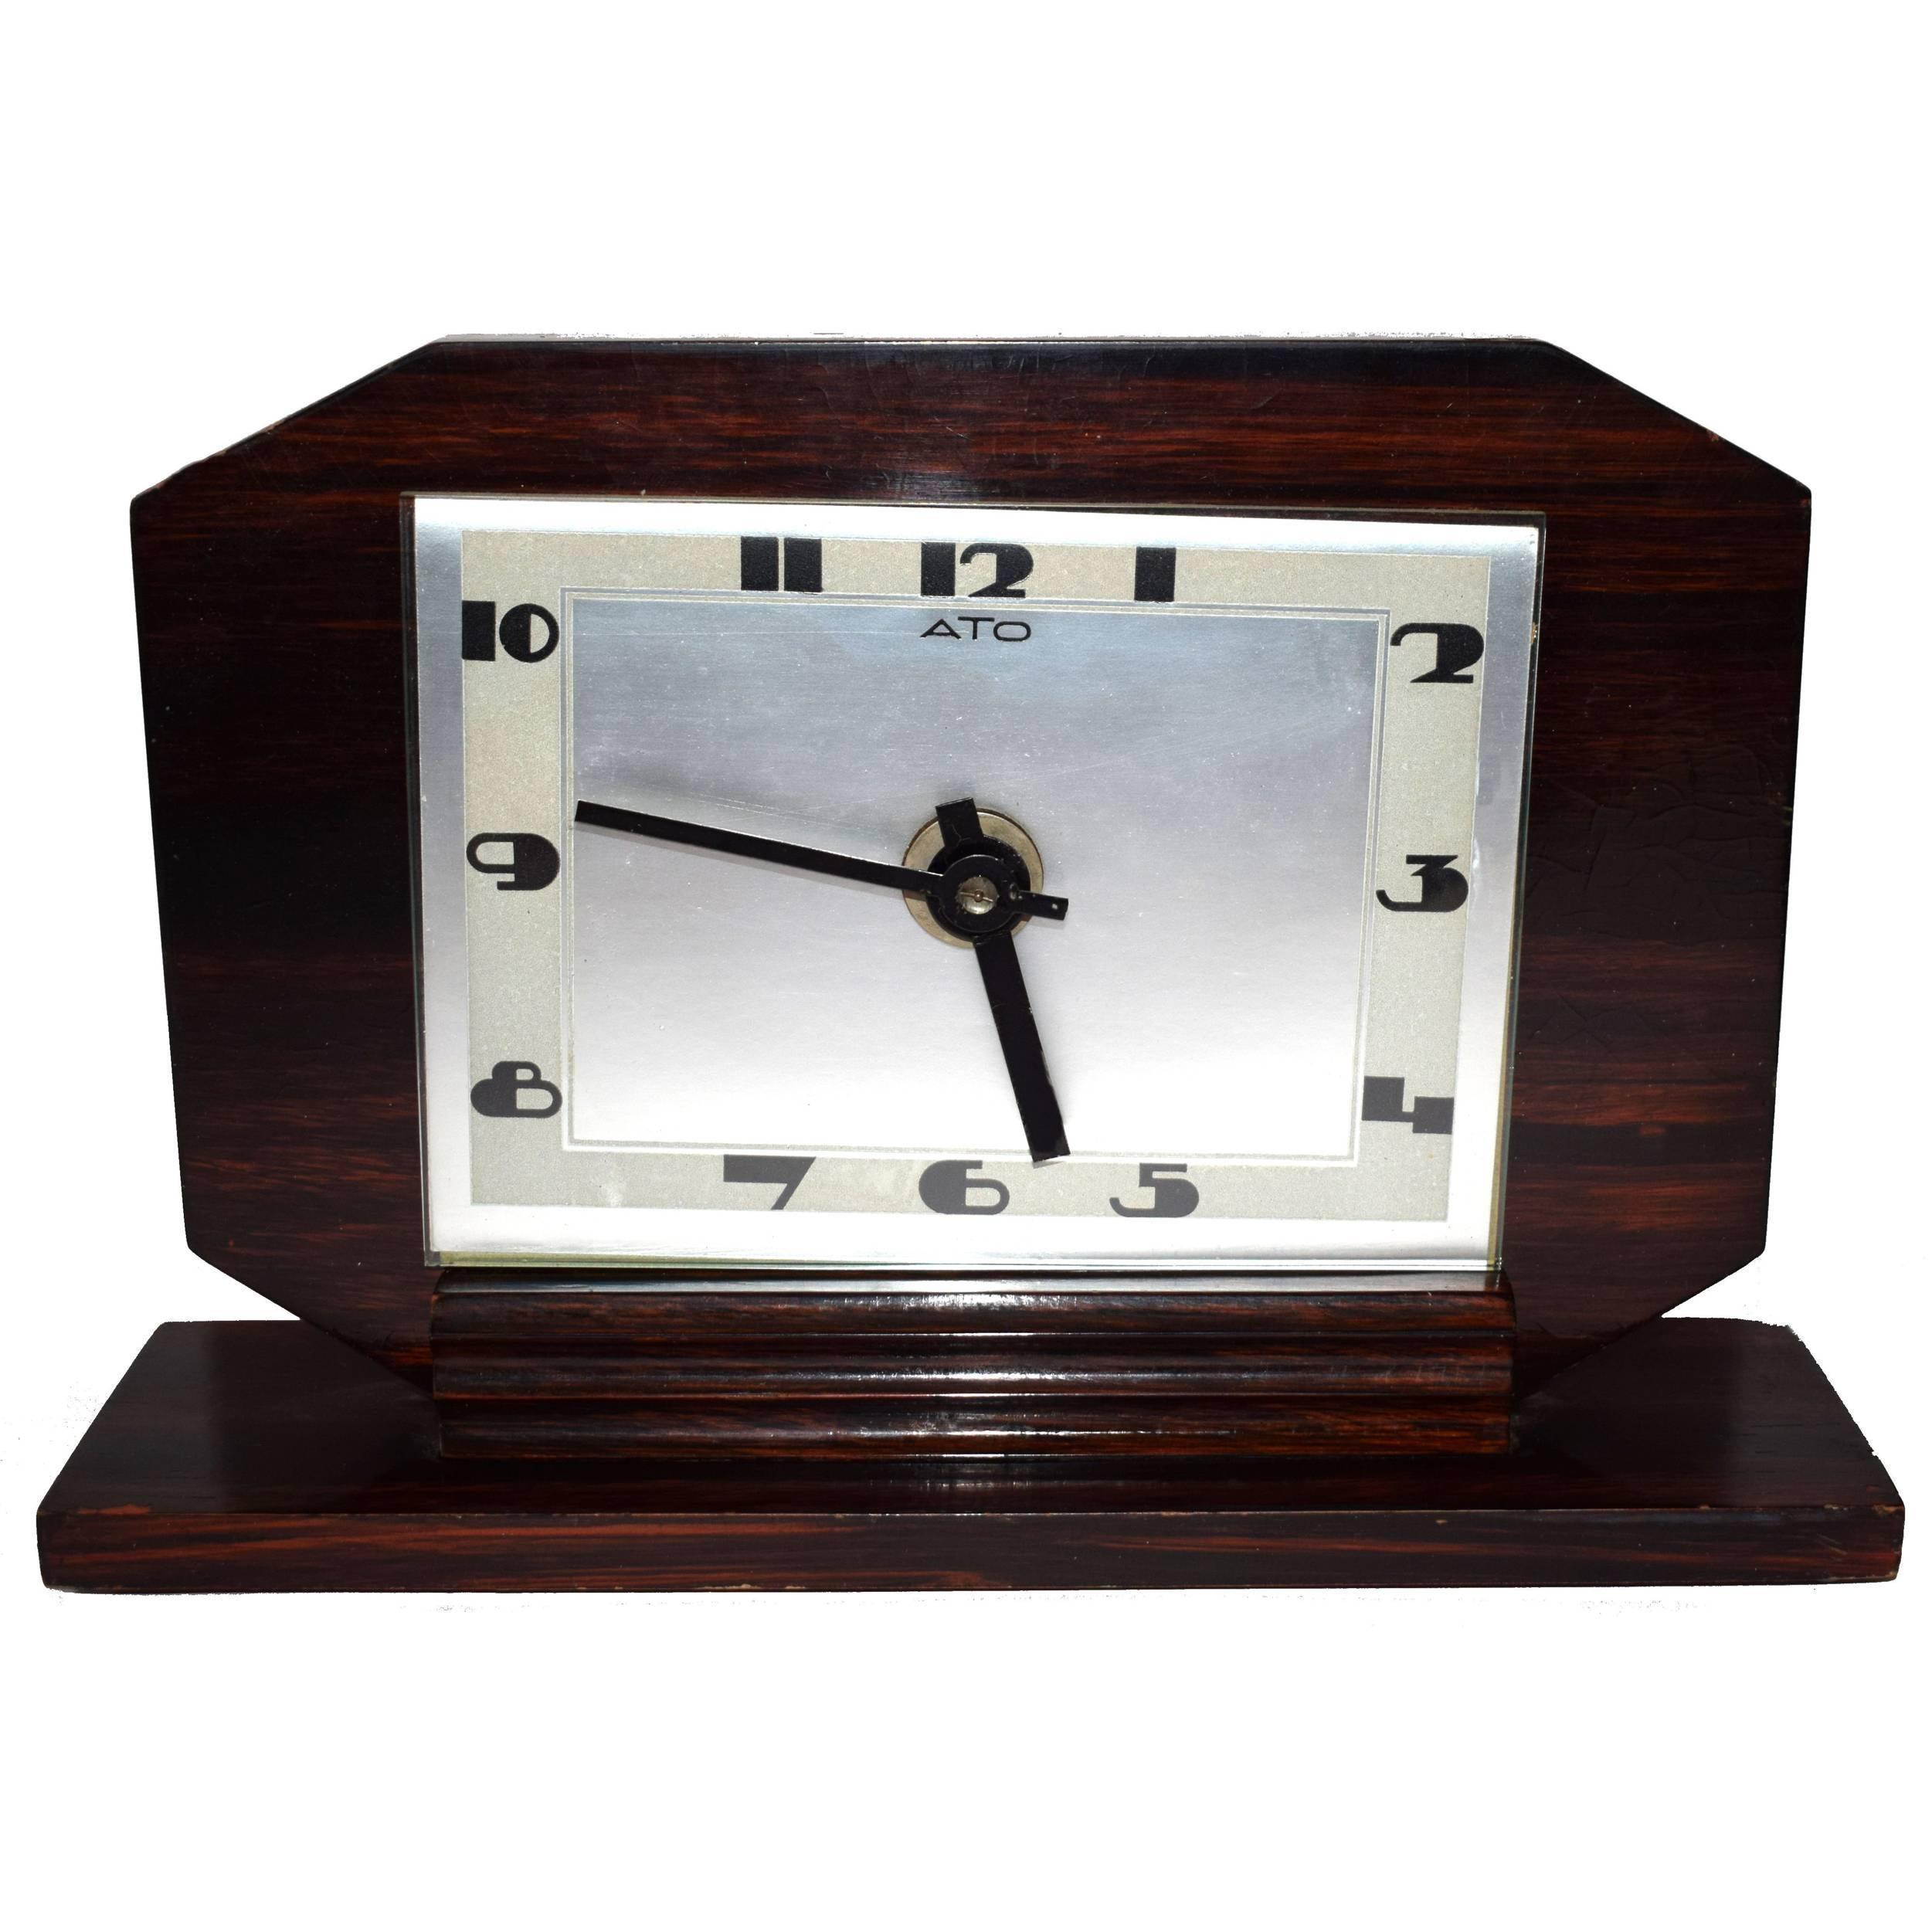 1930s Art Deco Modernist Clock by ATO